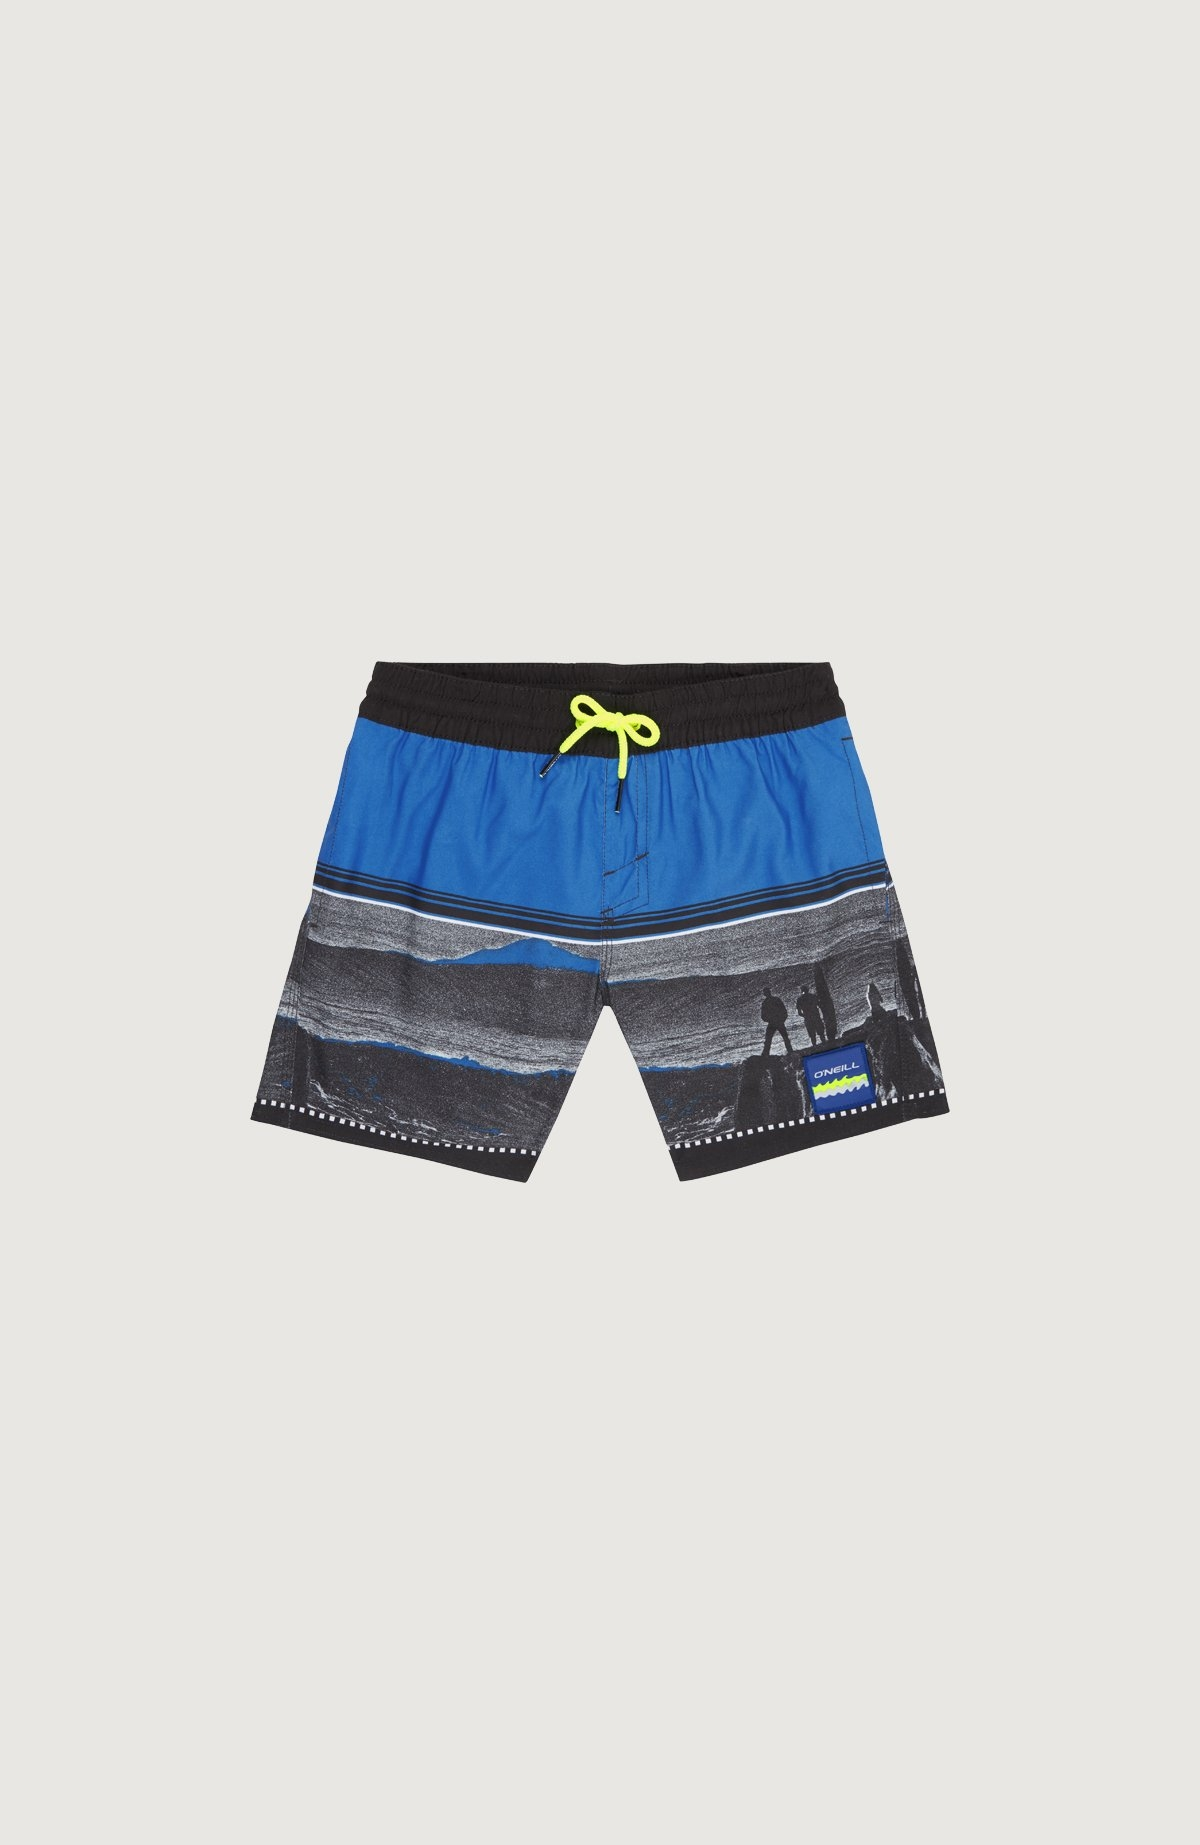 O'neill zwemshort »The Point Swim Shorts« veilig op otto.nl kopen